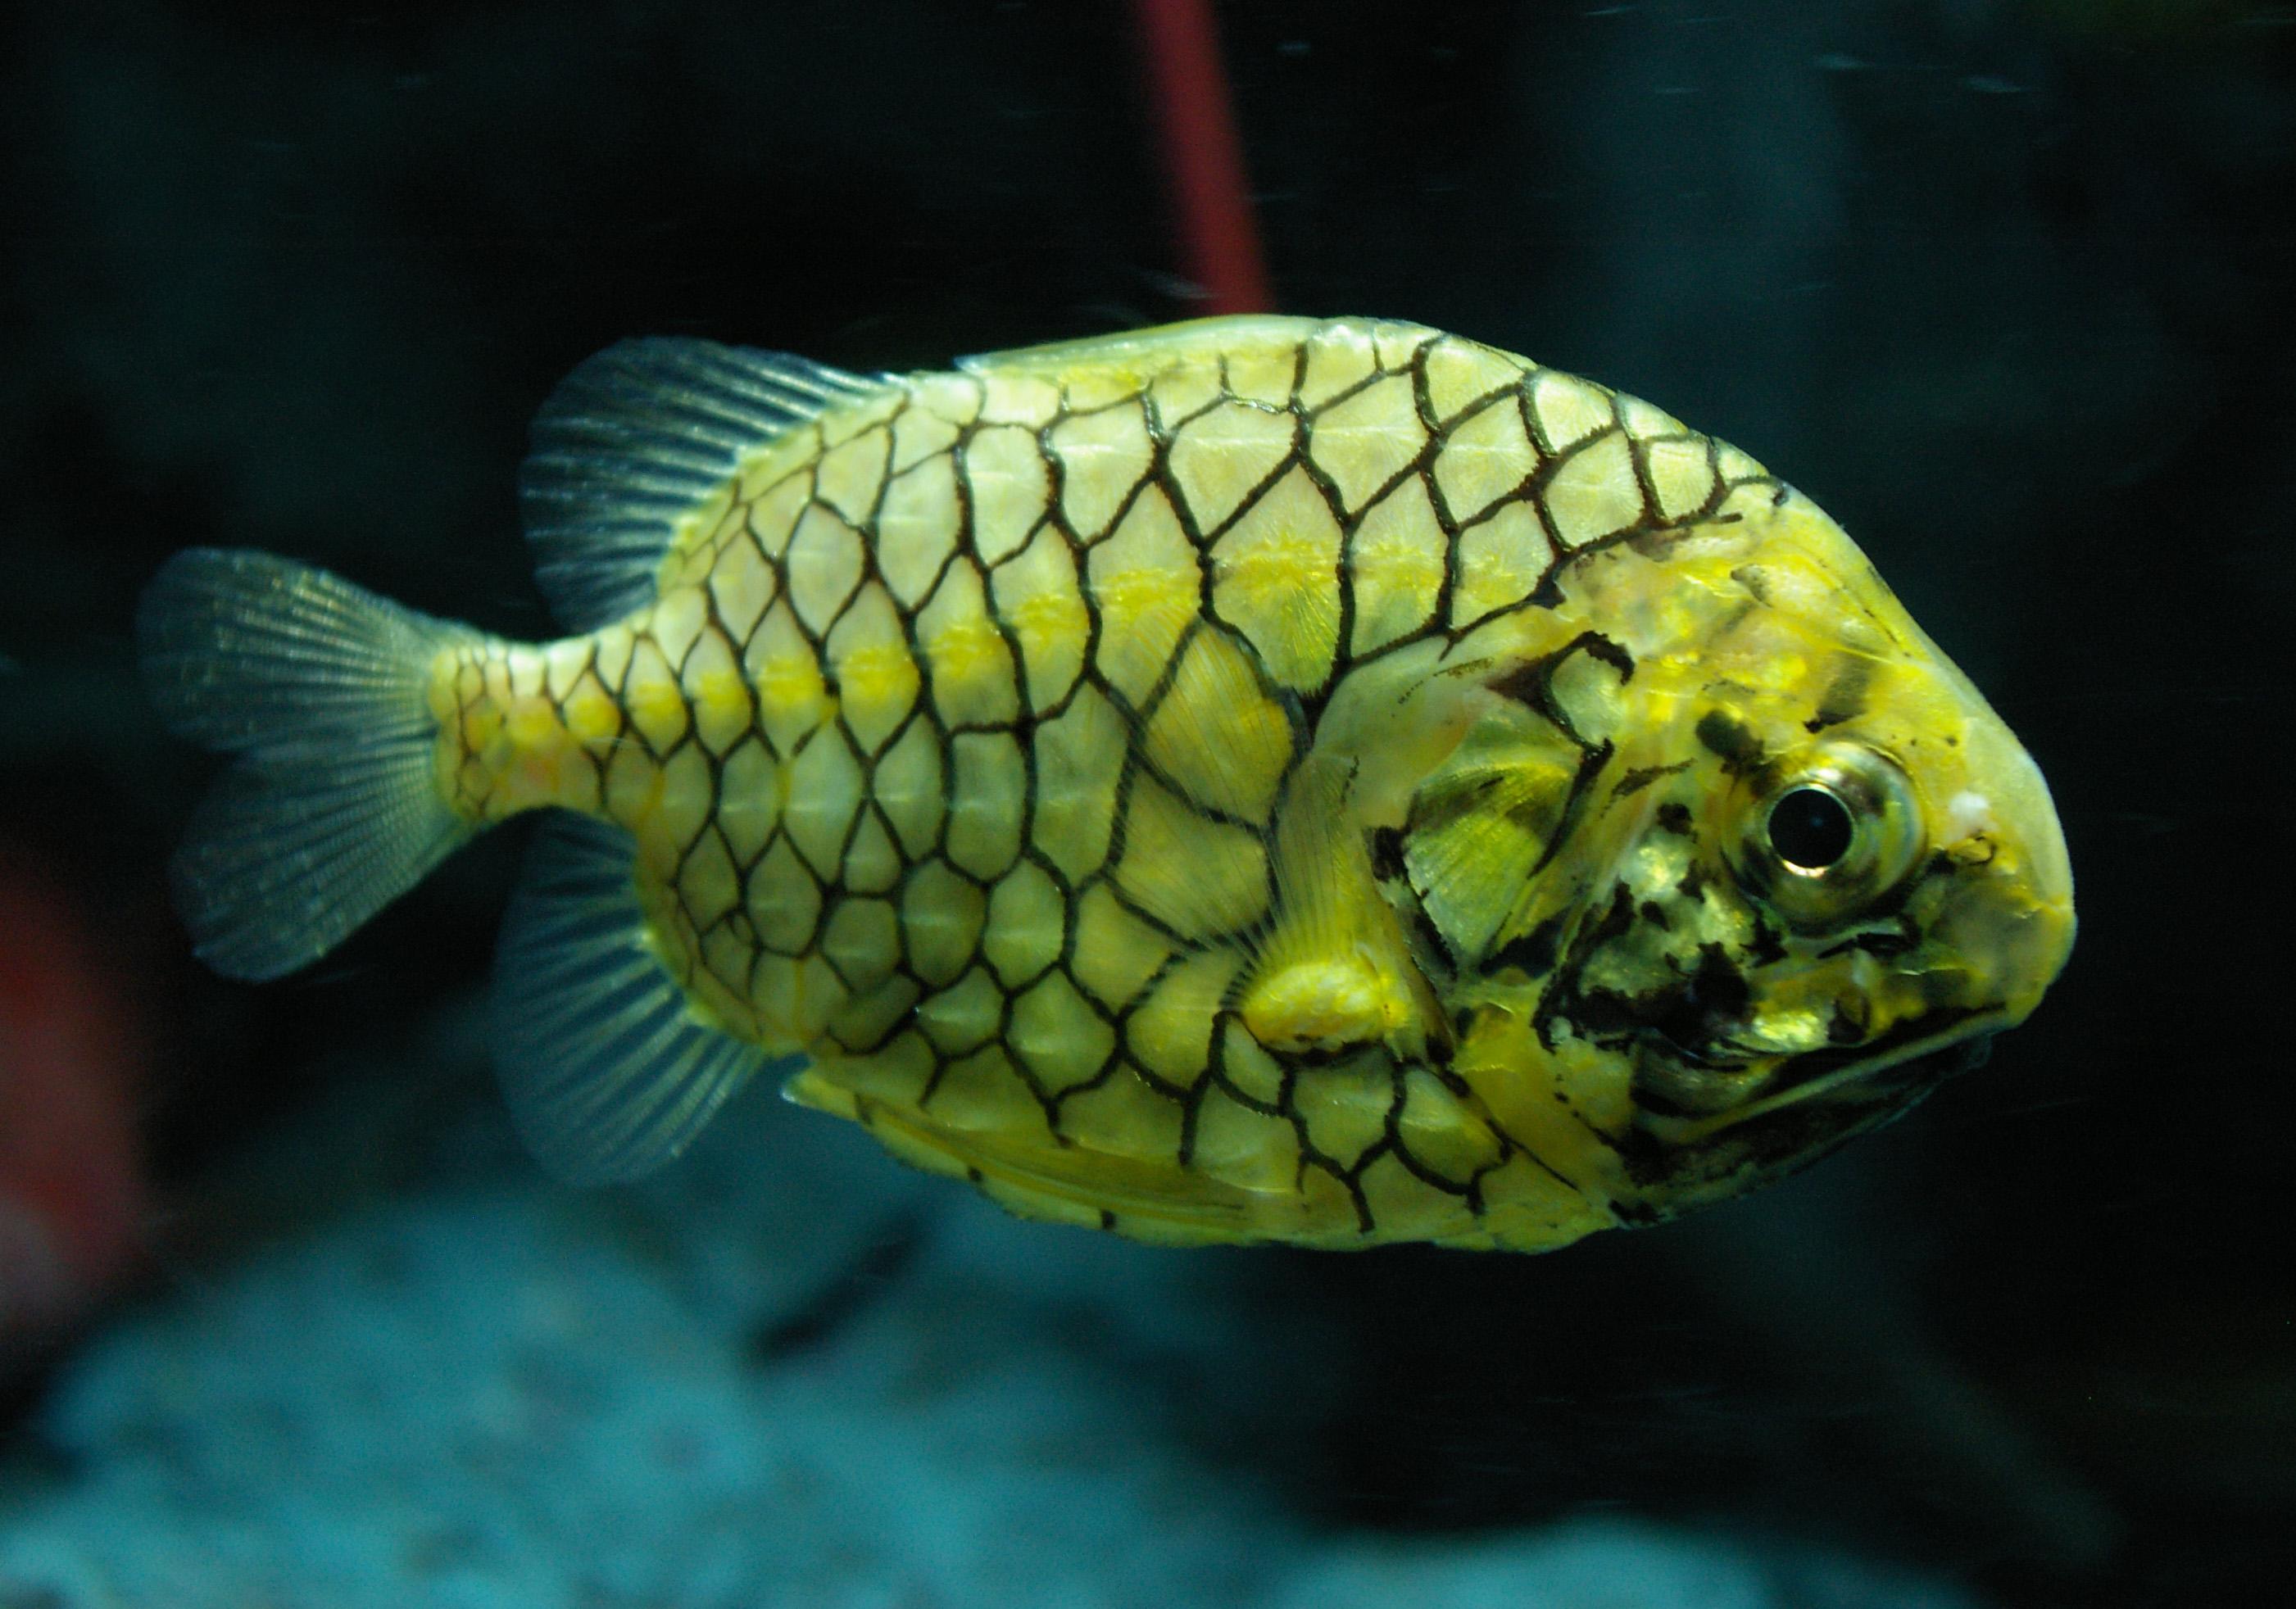 Pinecone File Pinecone Fish Jpg Wikimedia Commons